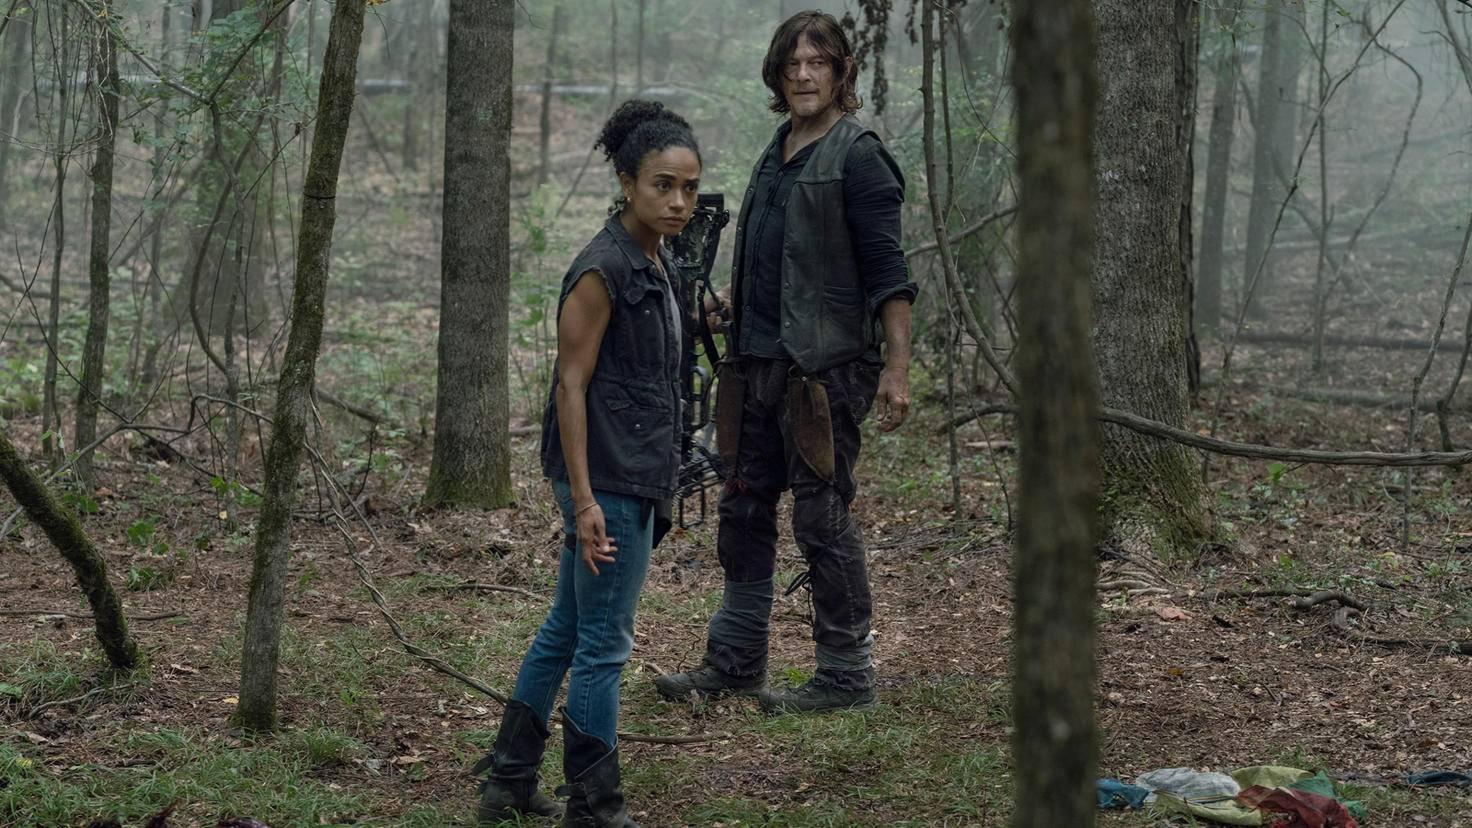 The Walking Dead-S10E05-Connie-Daryl-Jace Downs-AMC